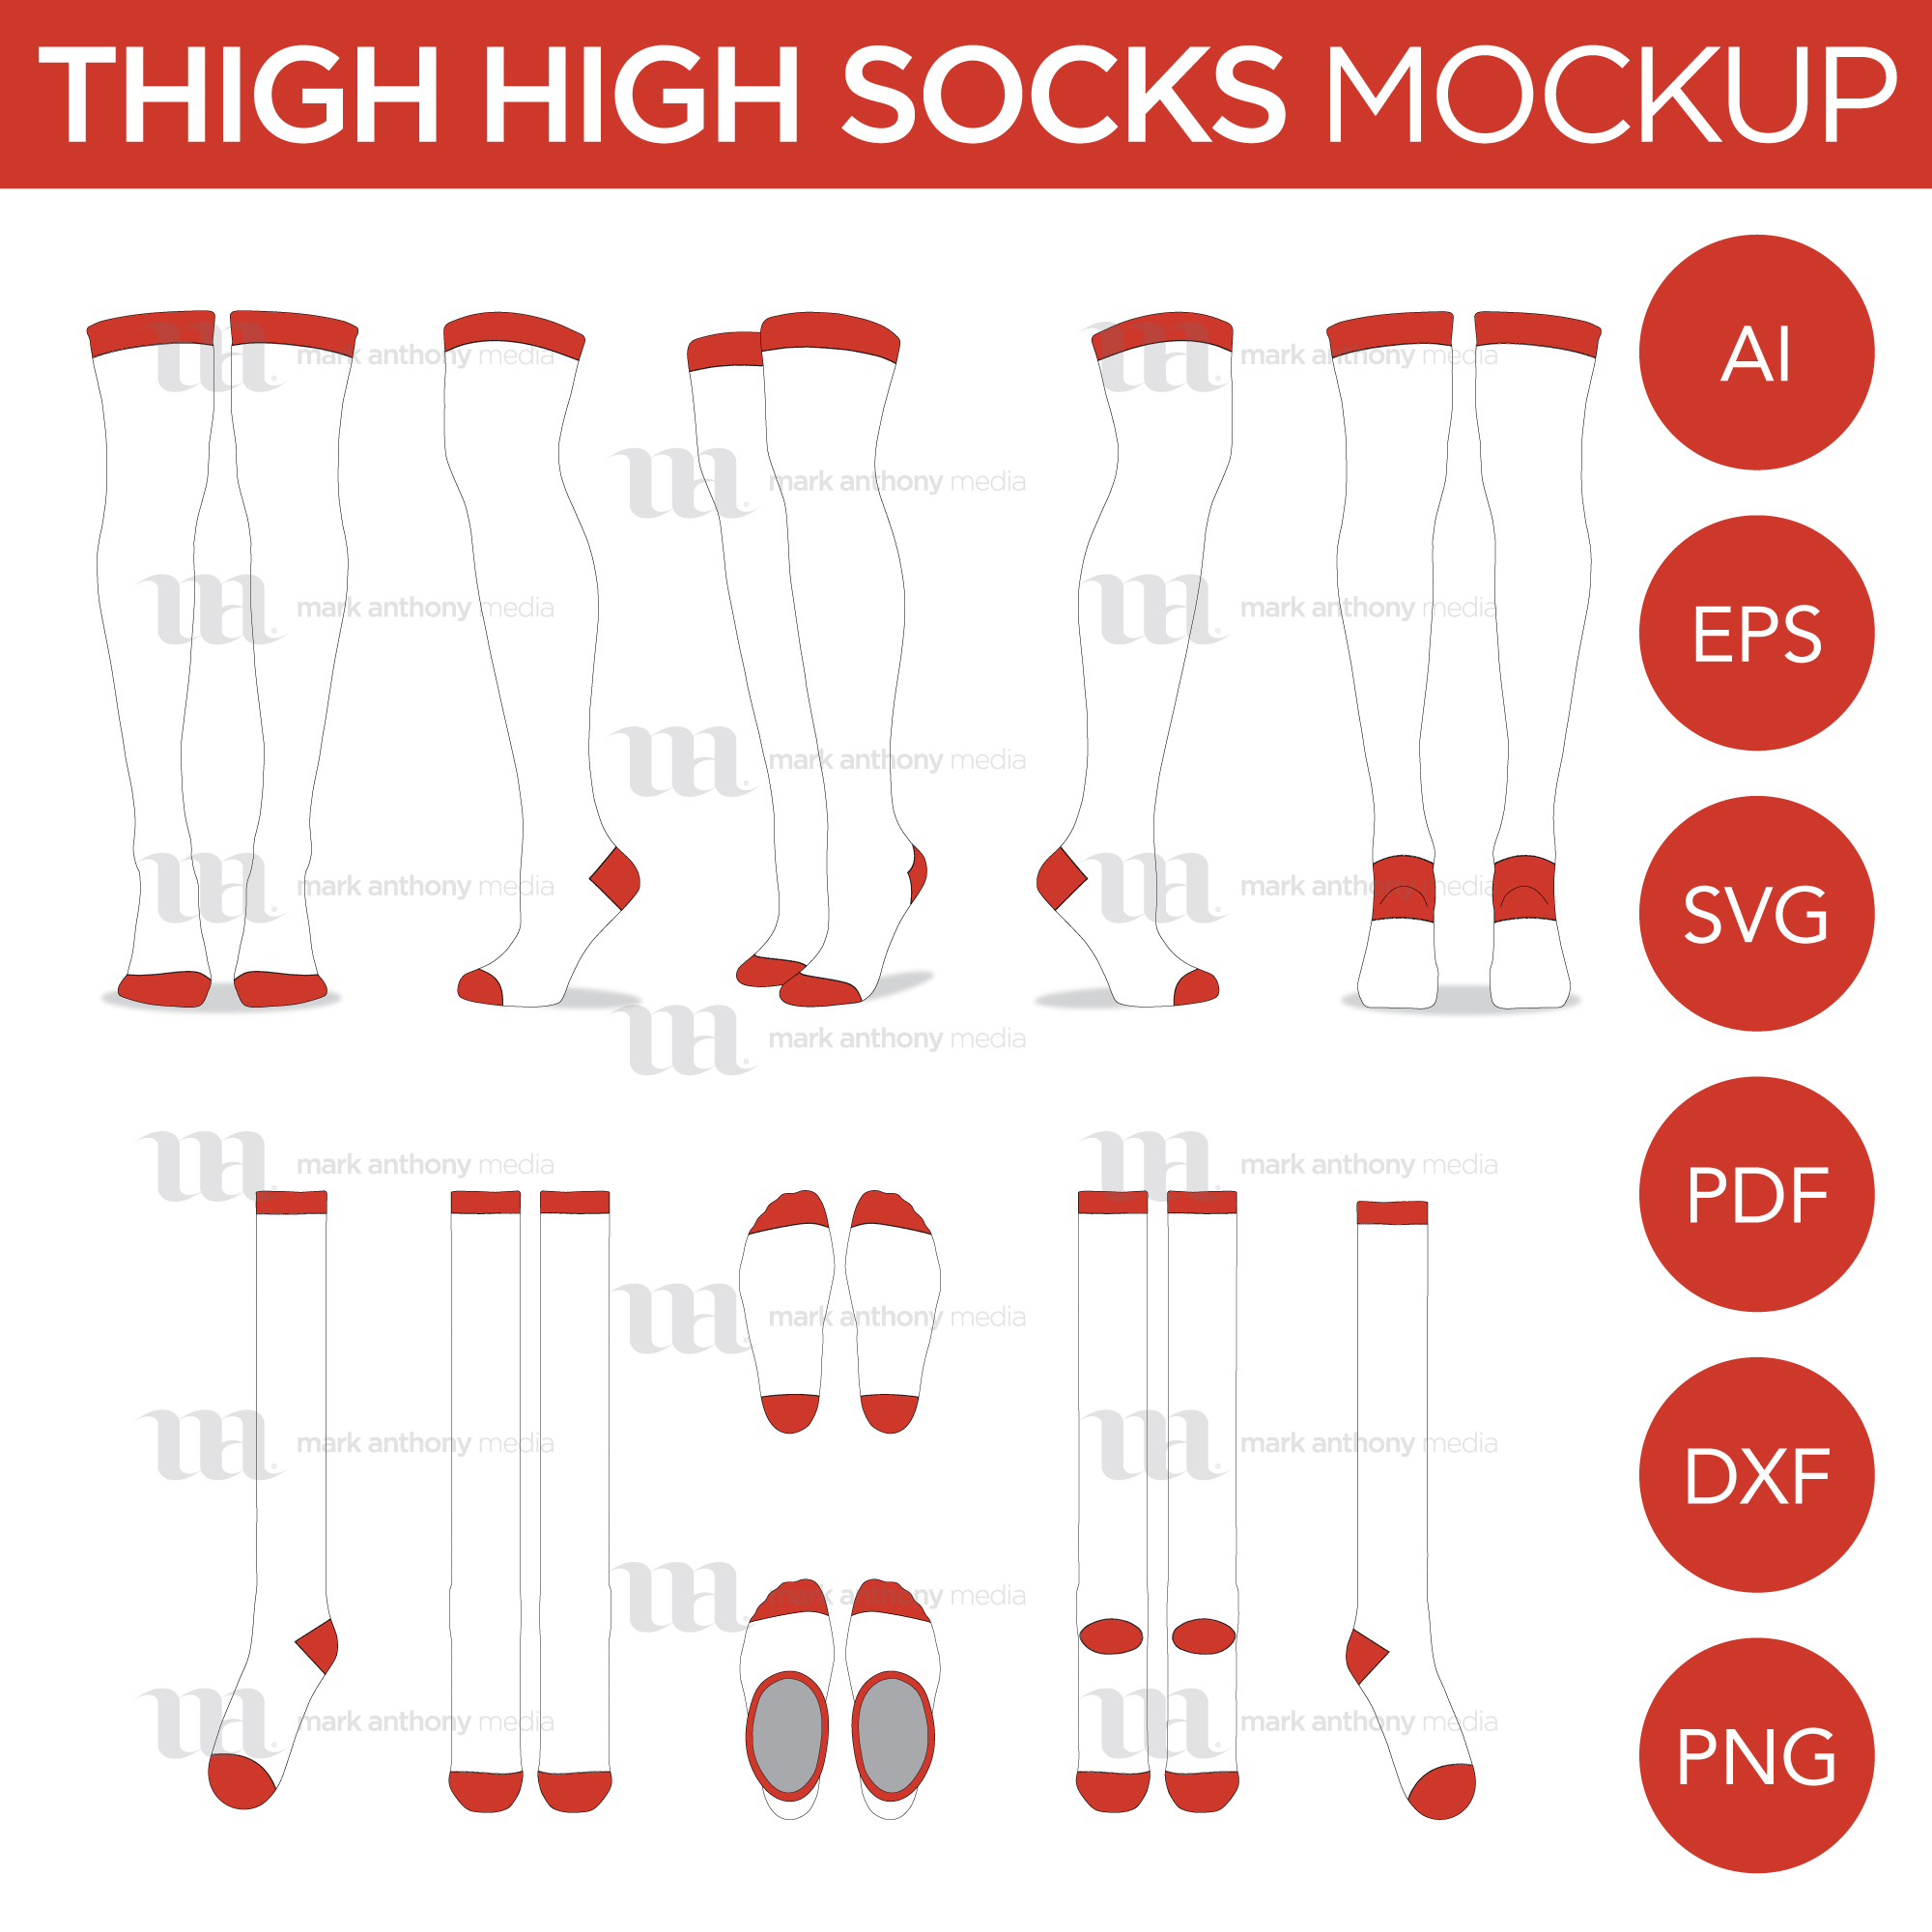 Thigh HIgh Socks Mockup Template Sample Mock Up Main Image